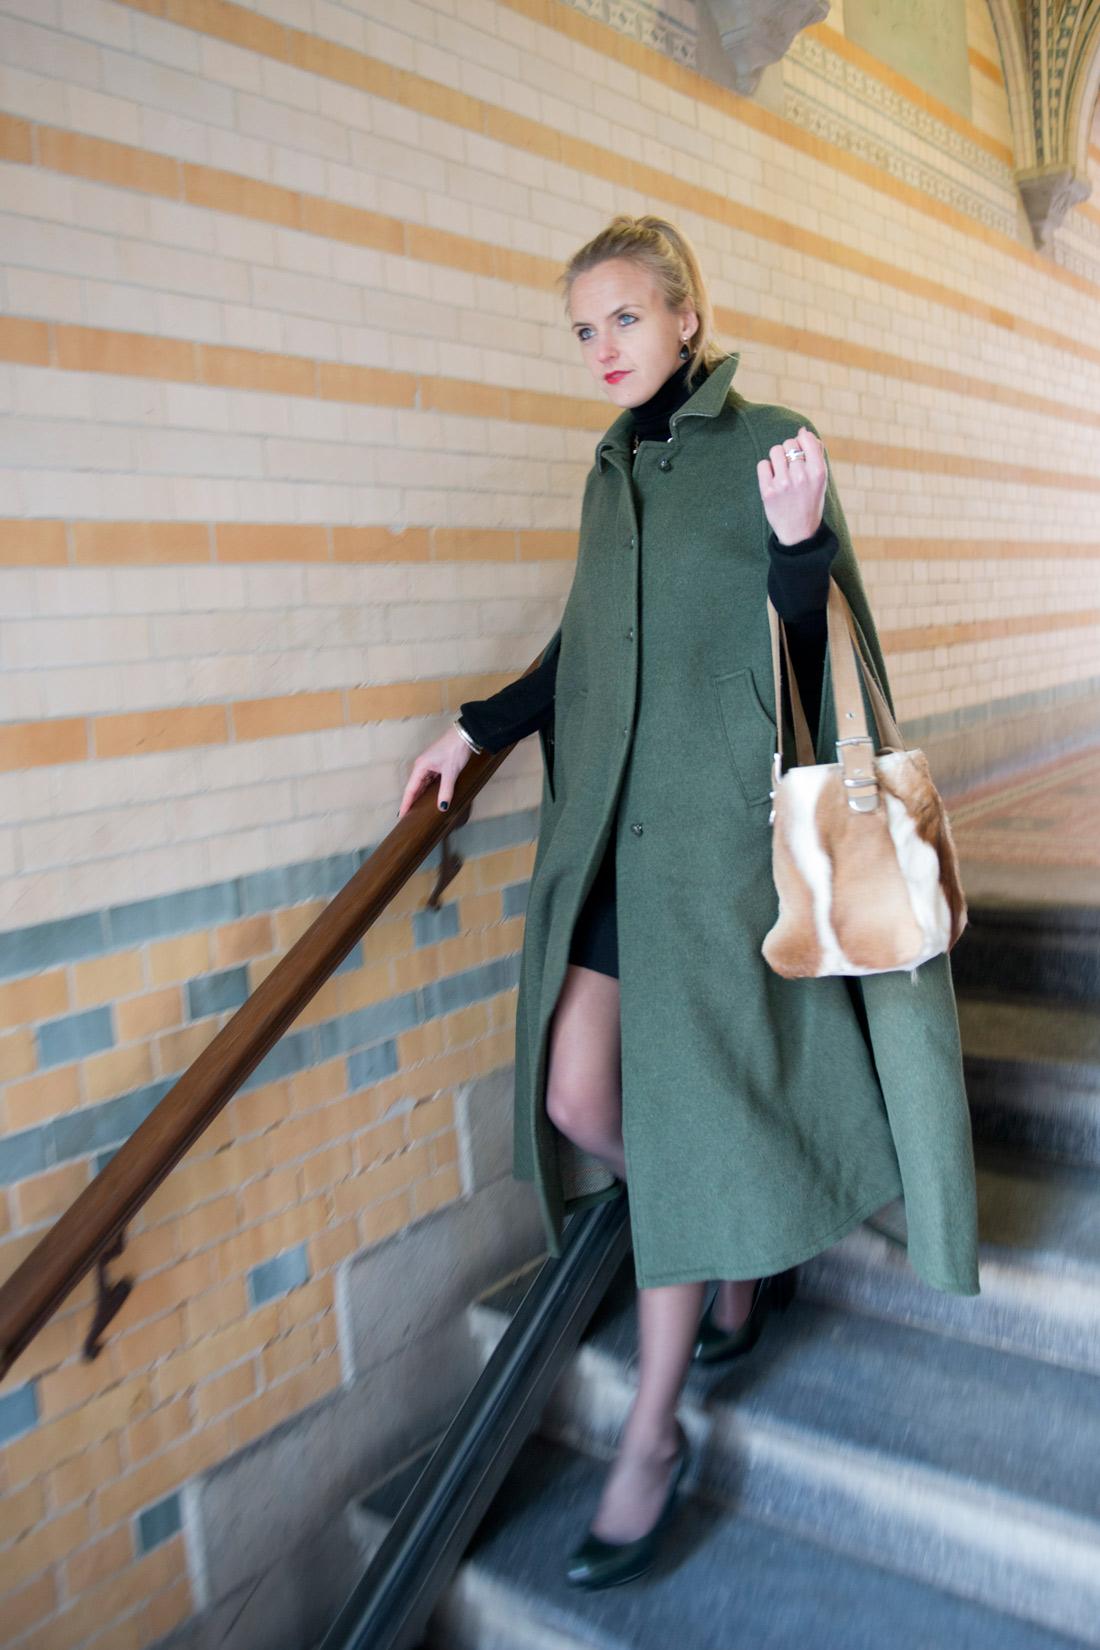 Bag-at-you---Fashion-blog---Timeless-elegance---Mantle-and-handbag